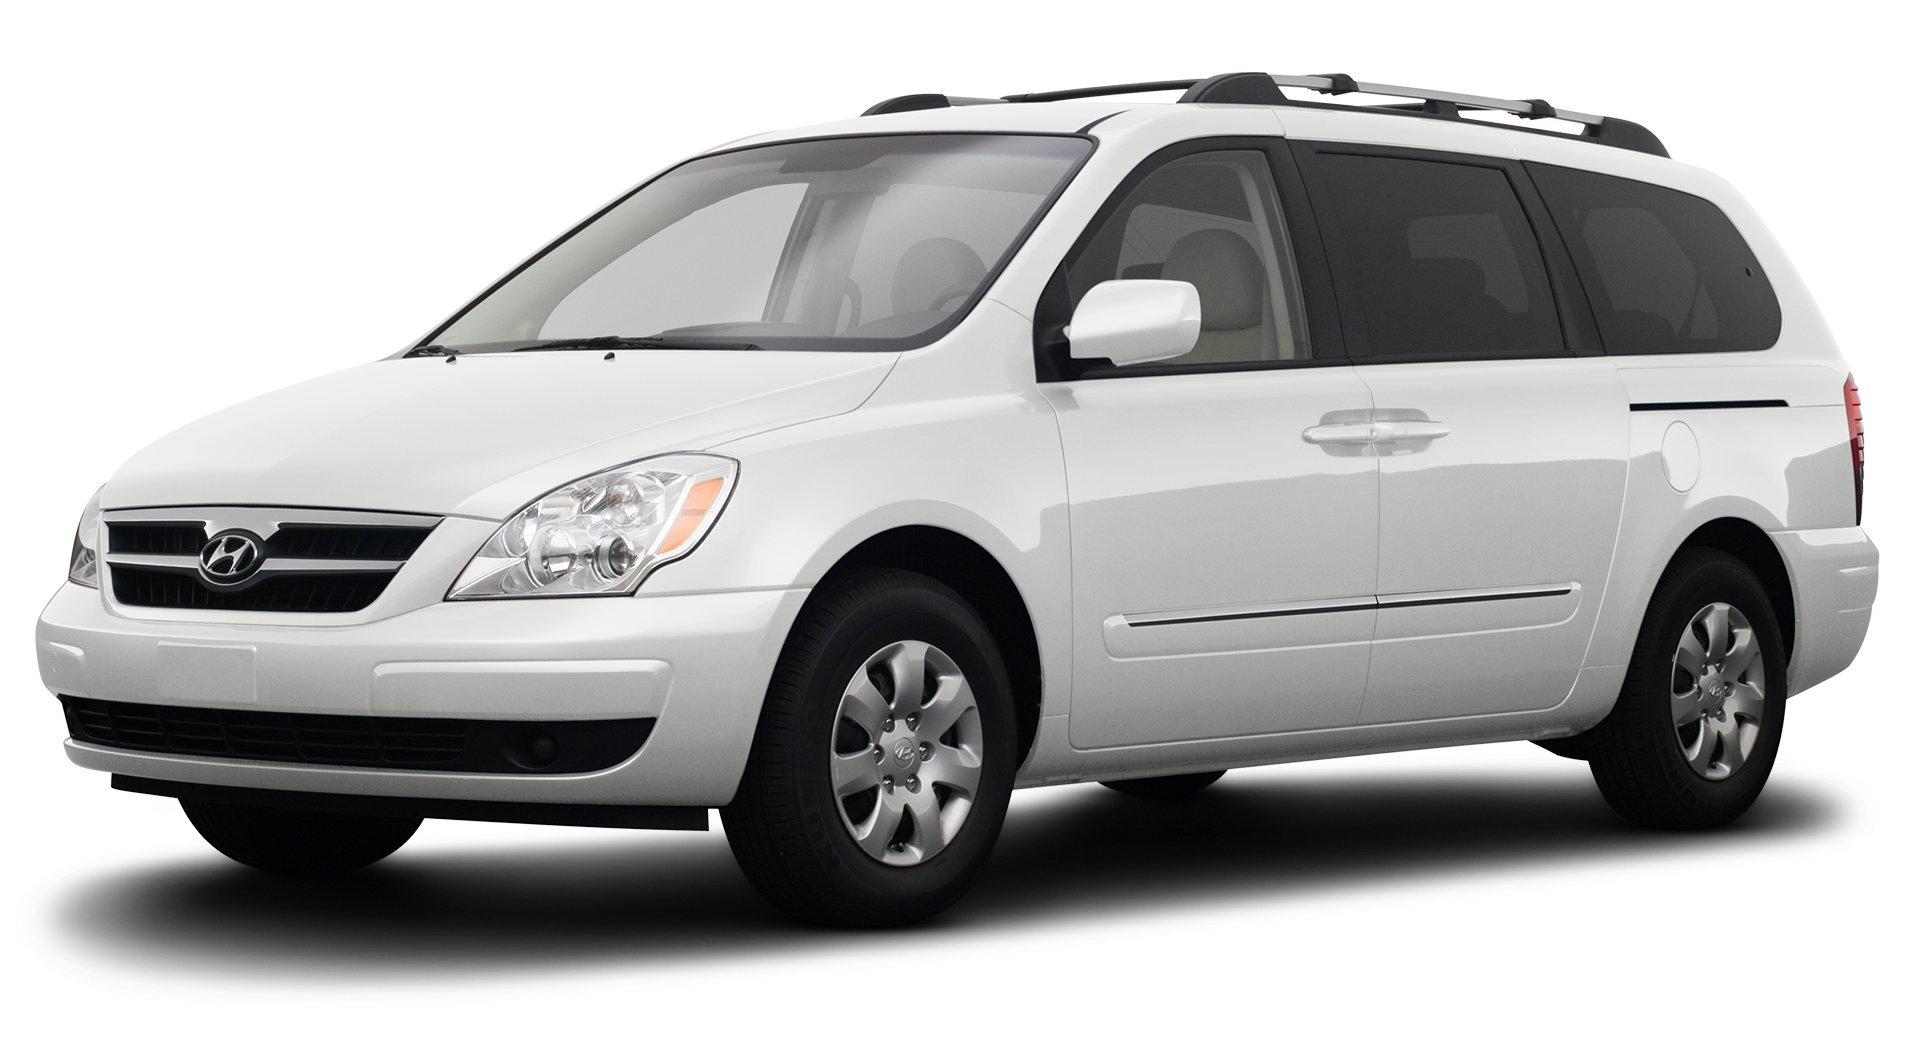 ... 2008 Hyundai Entourage GLS, 4-Door Wagon